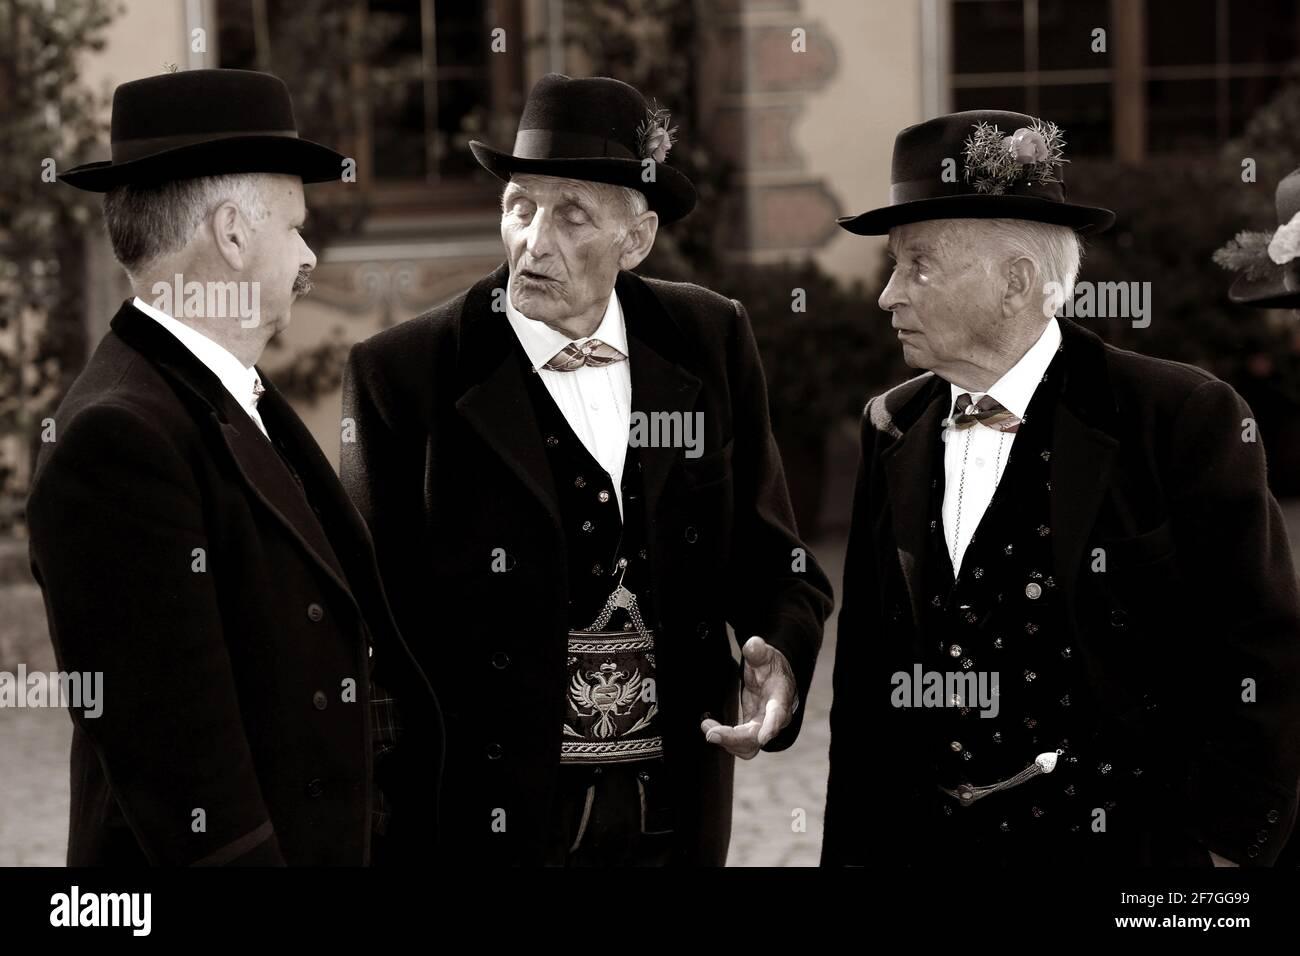 3 Trachtlern Banque D'Images